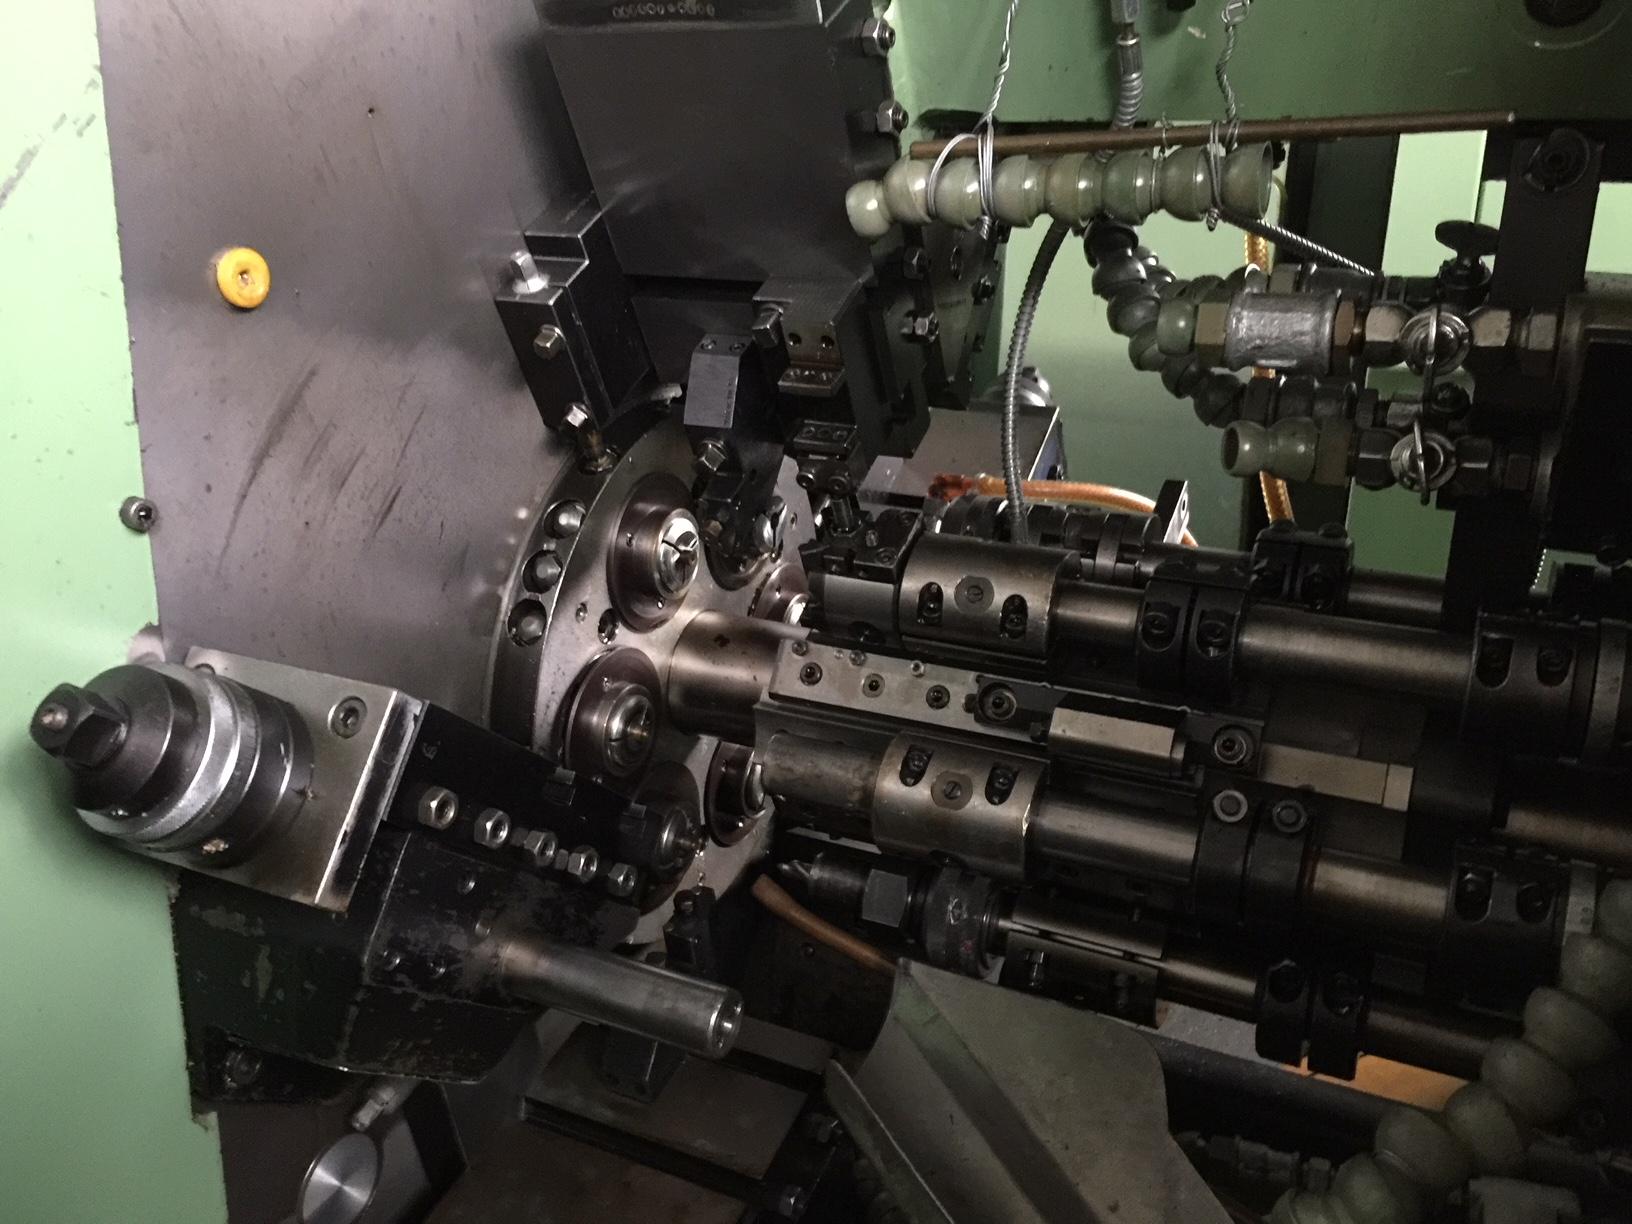 Lot 22 - Schutte Model SF 13-6, 6-Spindle Automatic Lathe